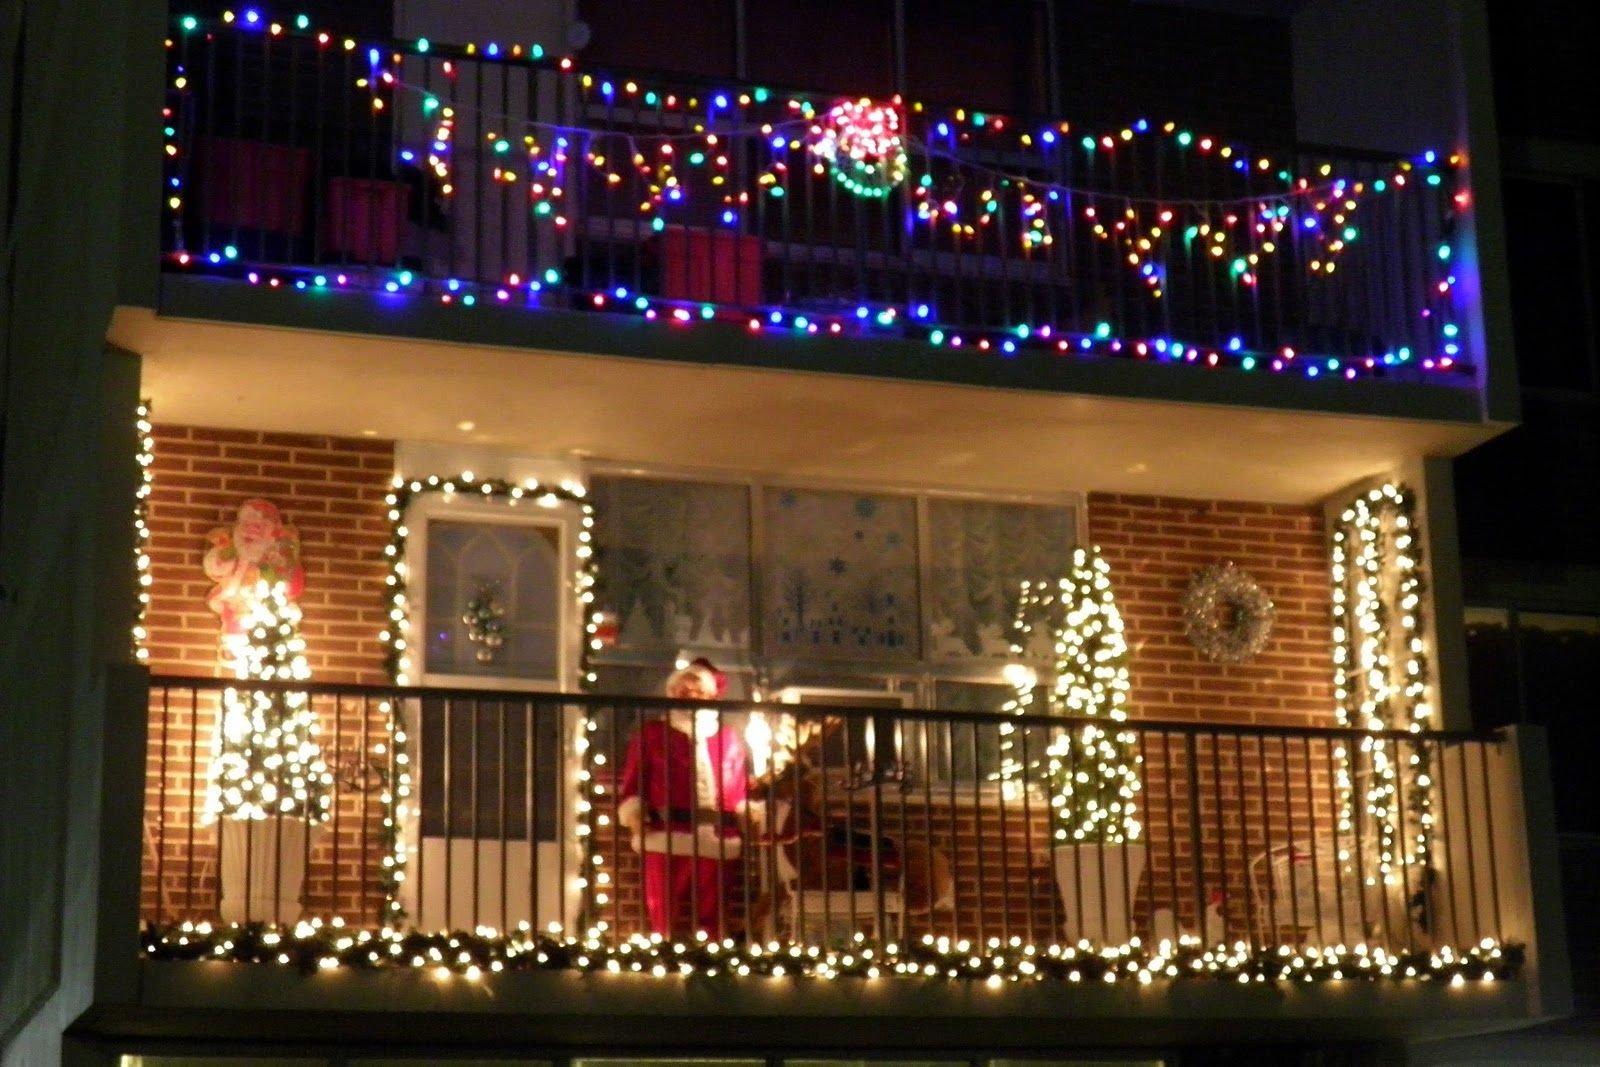 fresh christmas light ideas for balcony on exterior design with small balconies plan christmas on christmas balcony decorations apartment patio id=29162